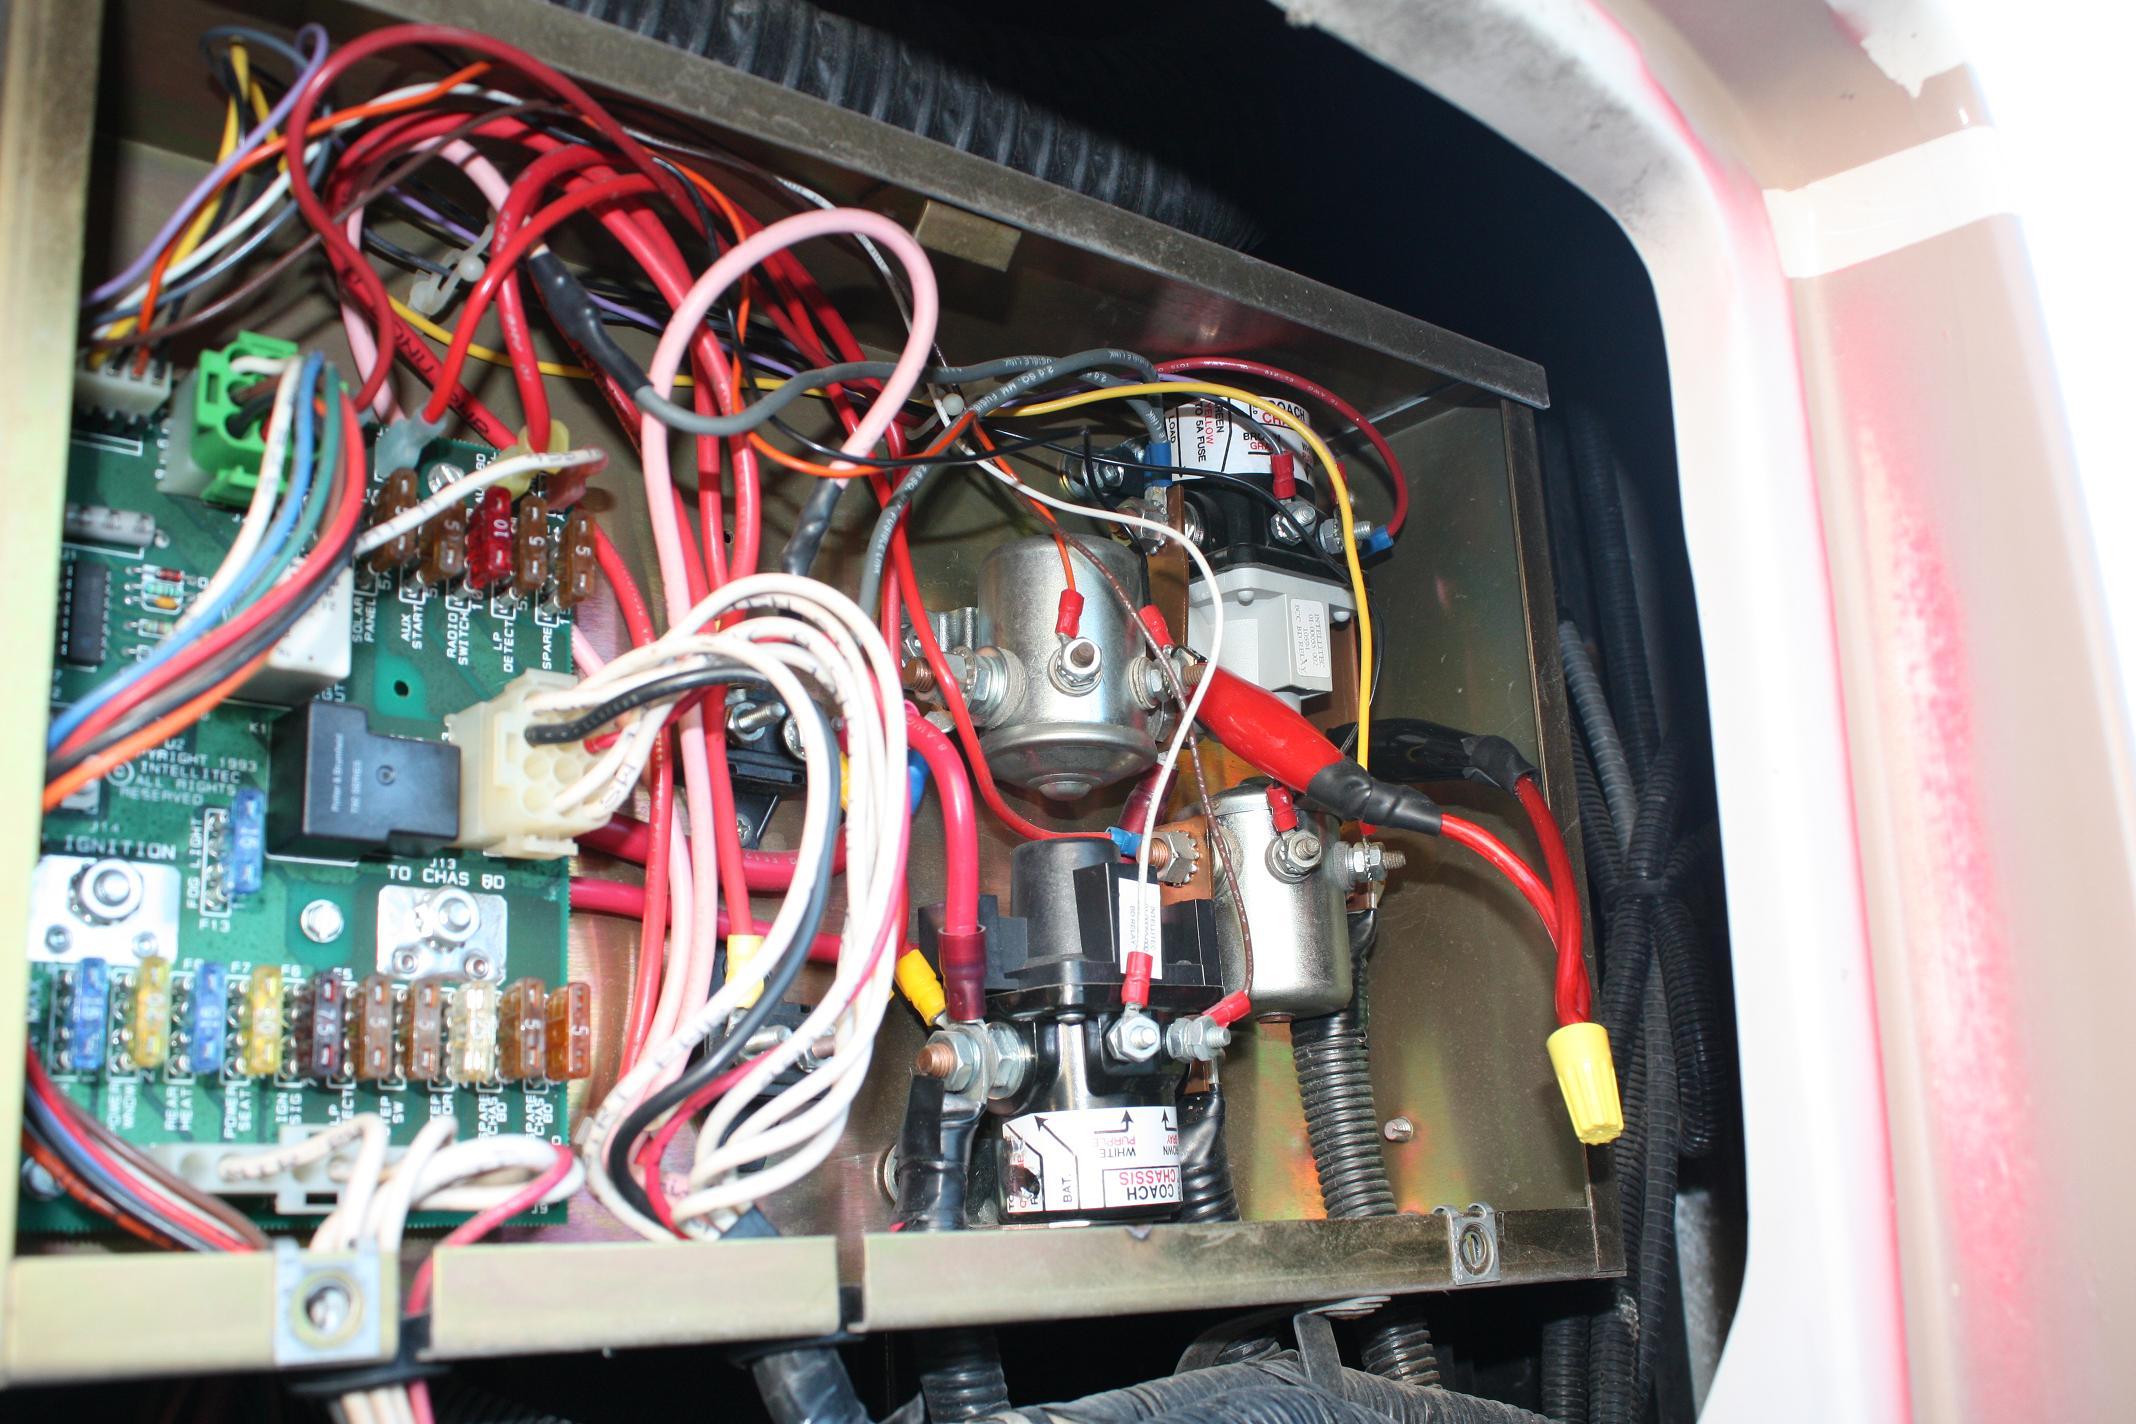 2009 11 28_033815_IMG_2174_c?resize=665%2C443 1987 winnebago chieftain wiring diagram the best wiring diagram 2017  at honlapkeszites.co